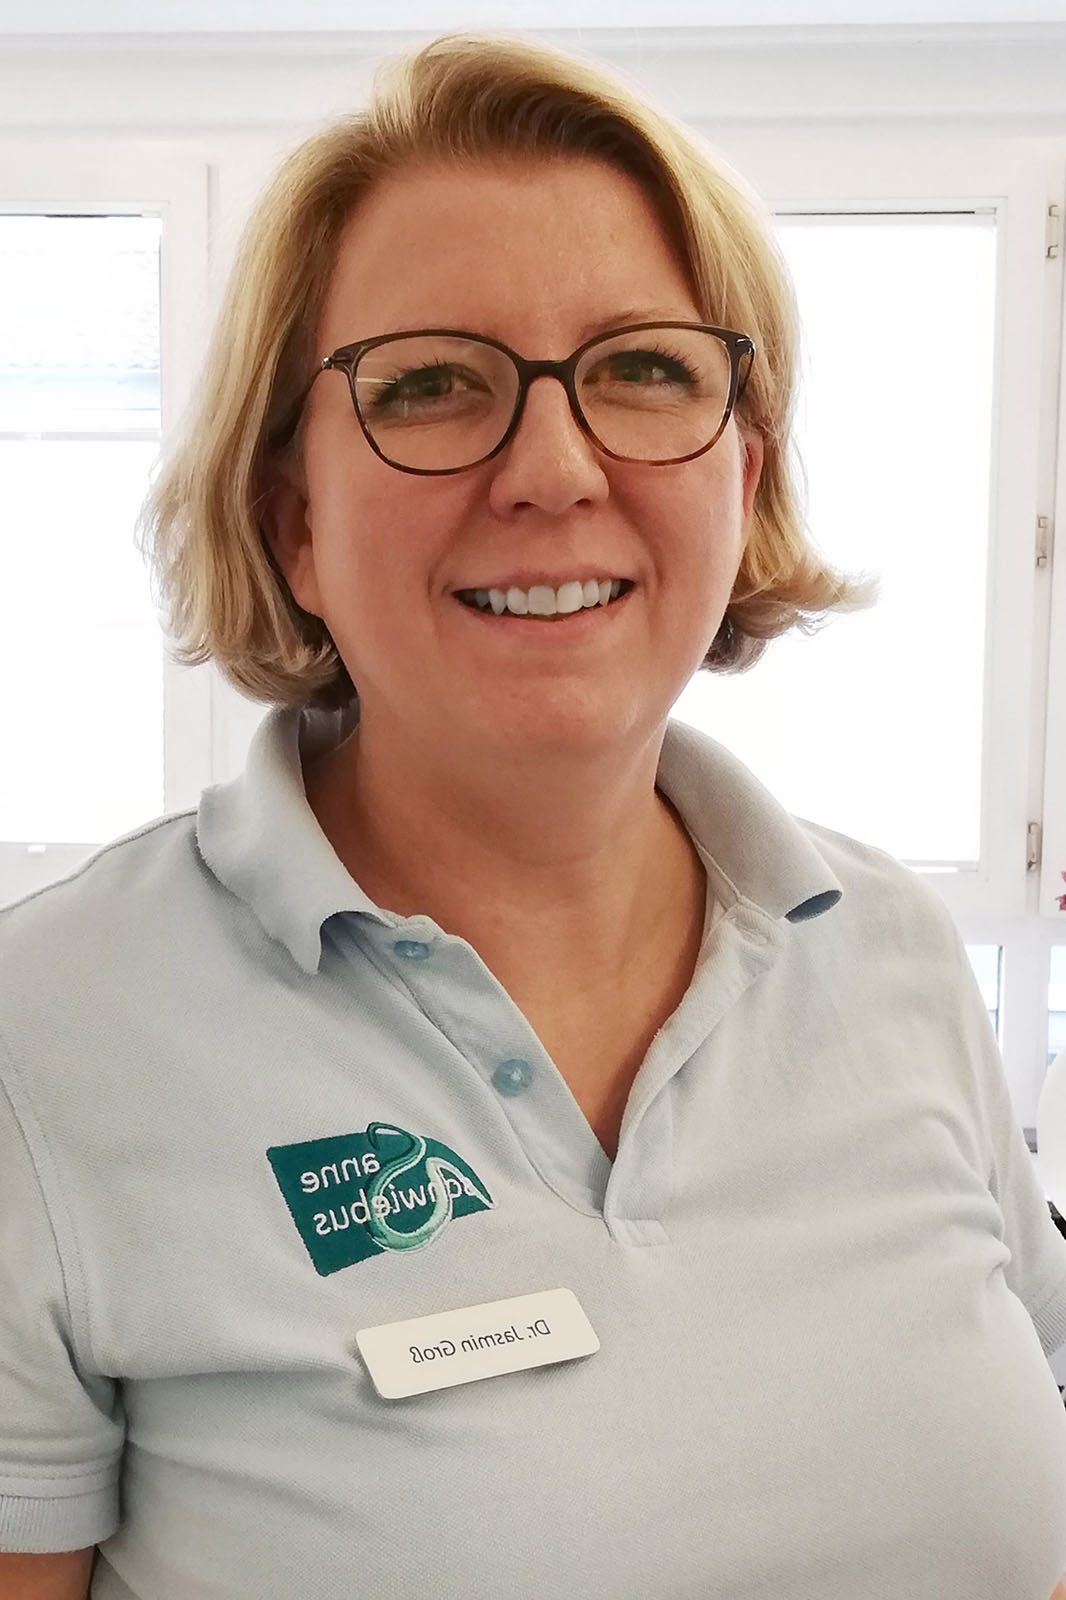 frauenarzt-praxis-kaiserslautern-anne-schwiebus-team-Jasmin-Gross